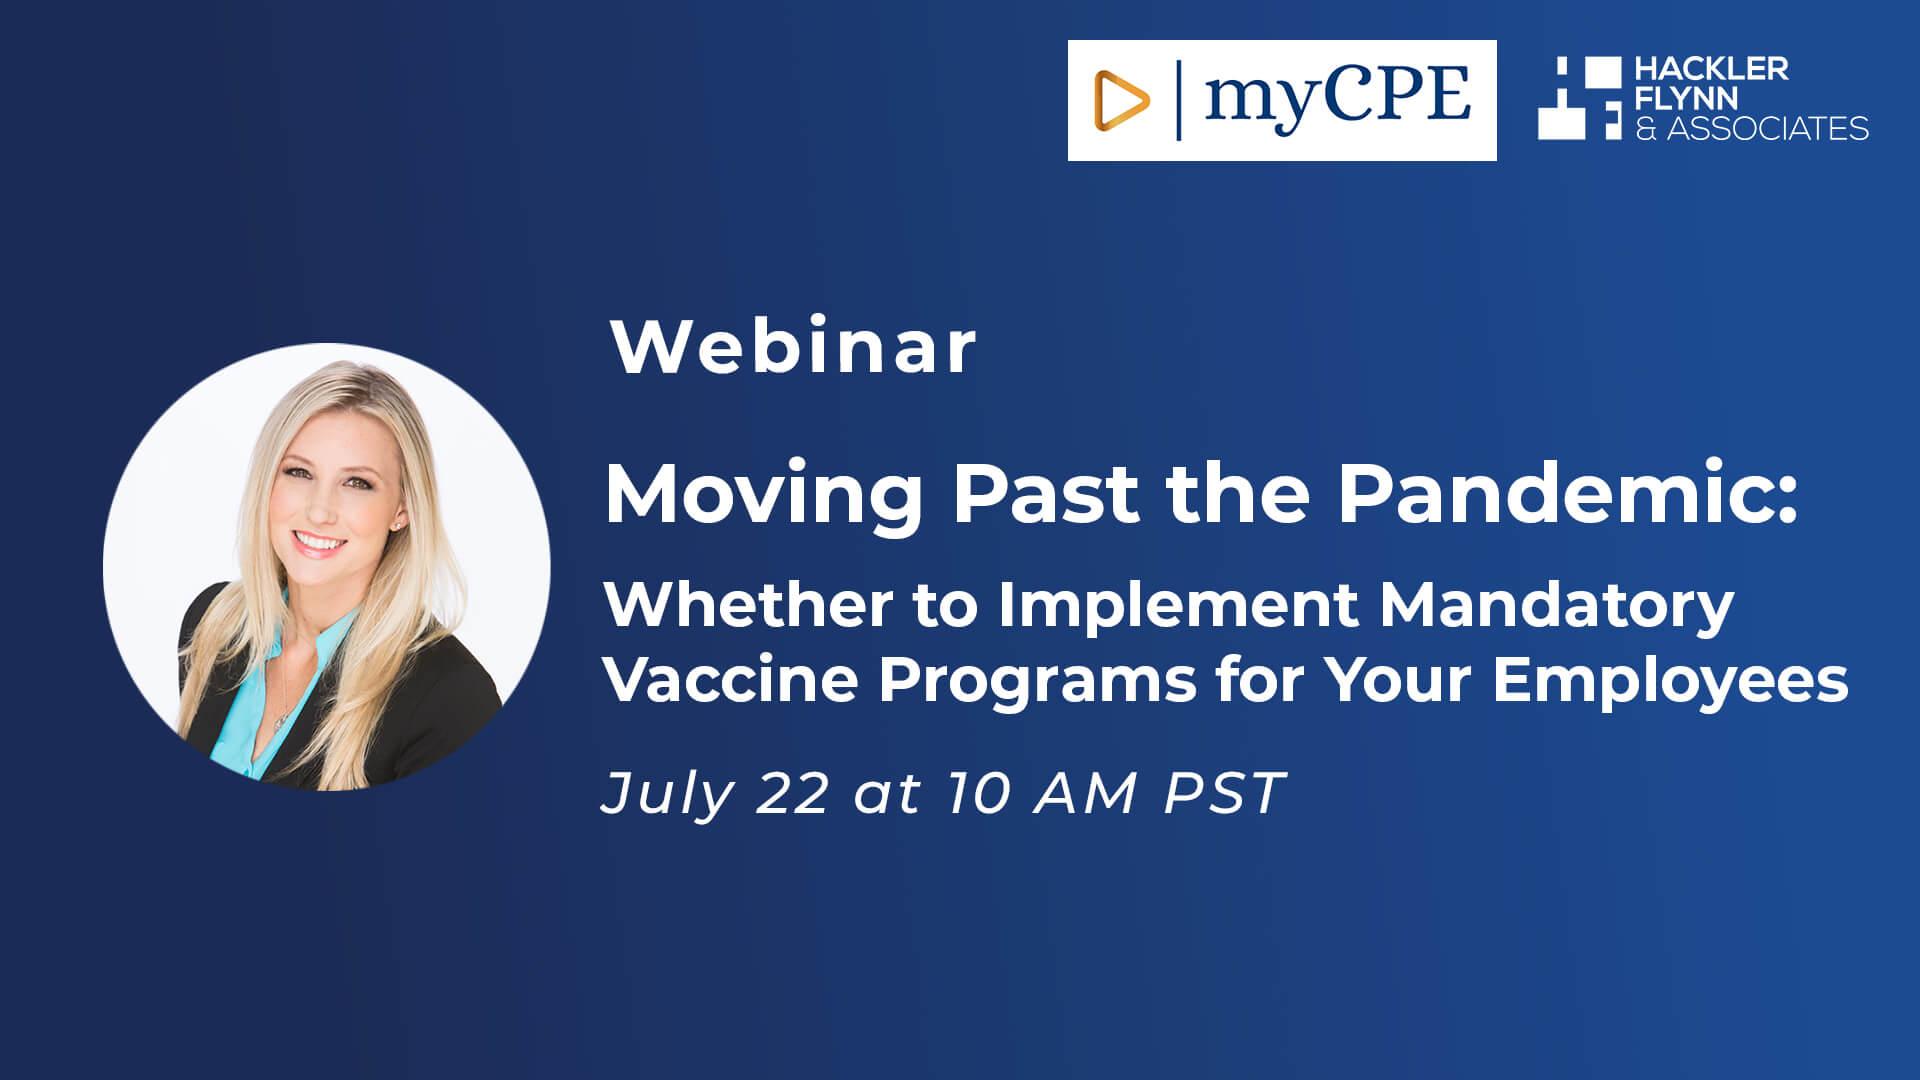 Webinar Graphic for Mandatory Vaccine Programs